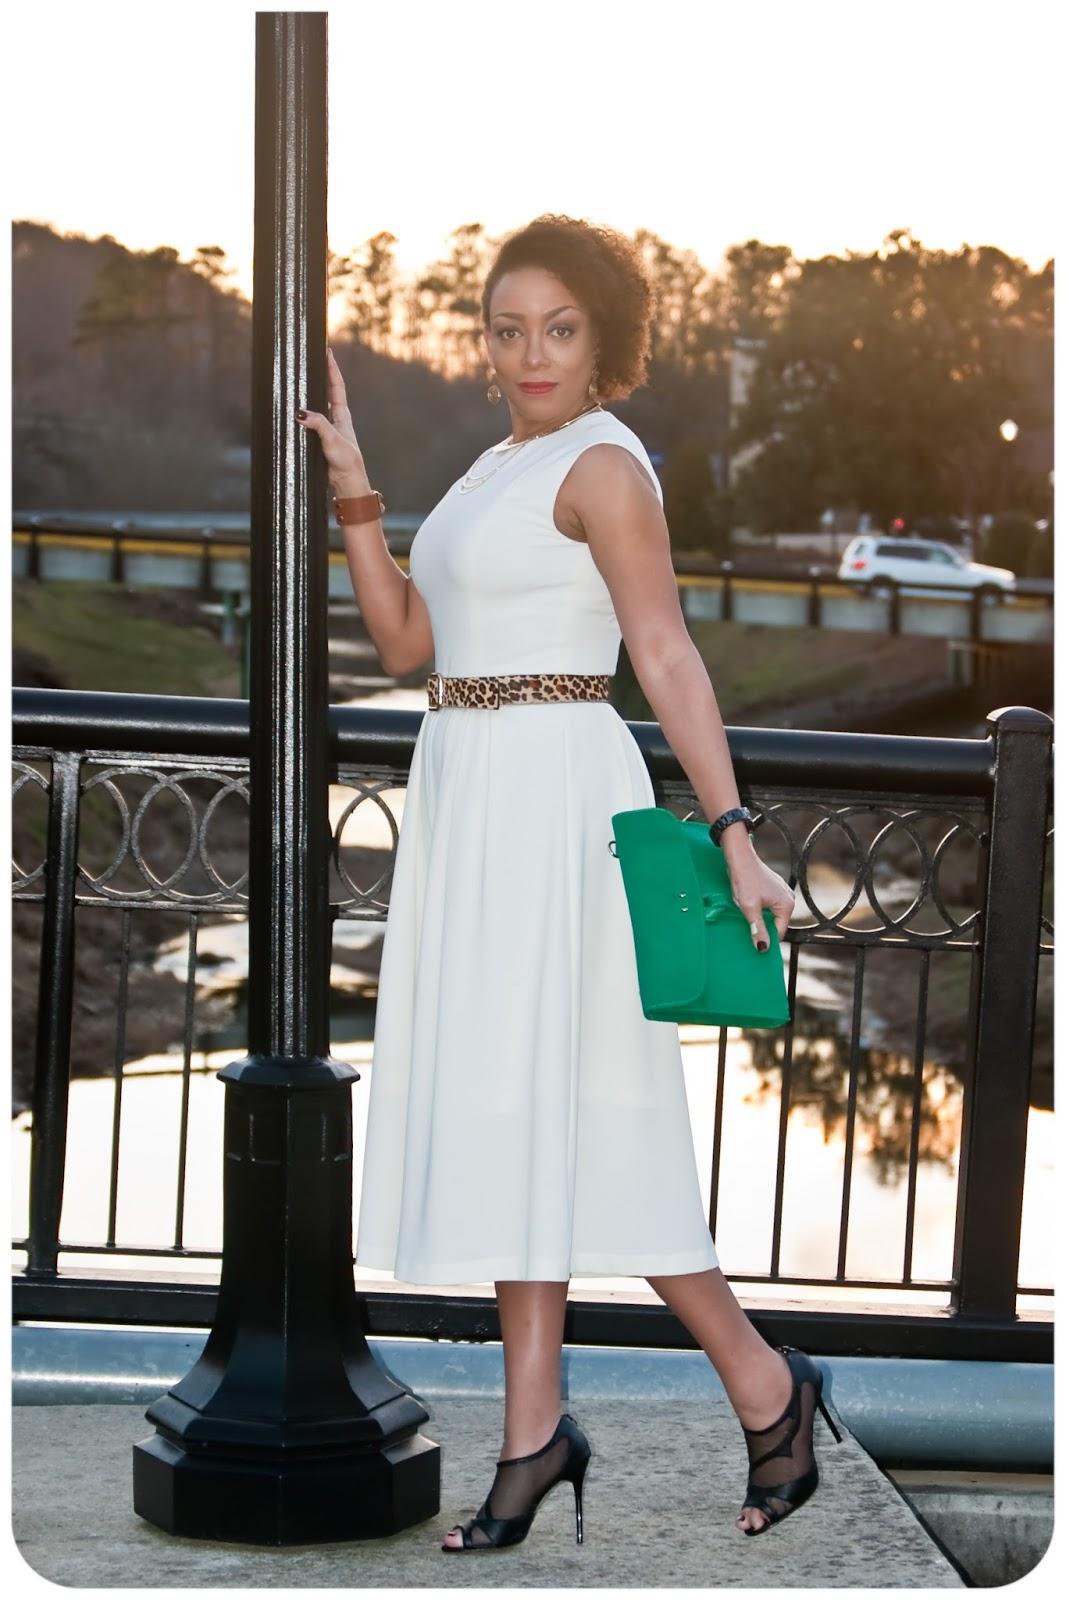 Vogue 9075 | Cream Crepe Culotte Jumpsuit! - Erica B's DIY Style!